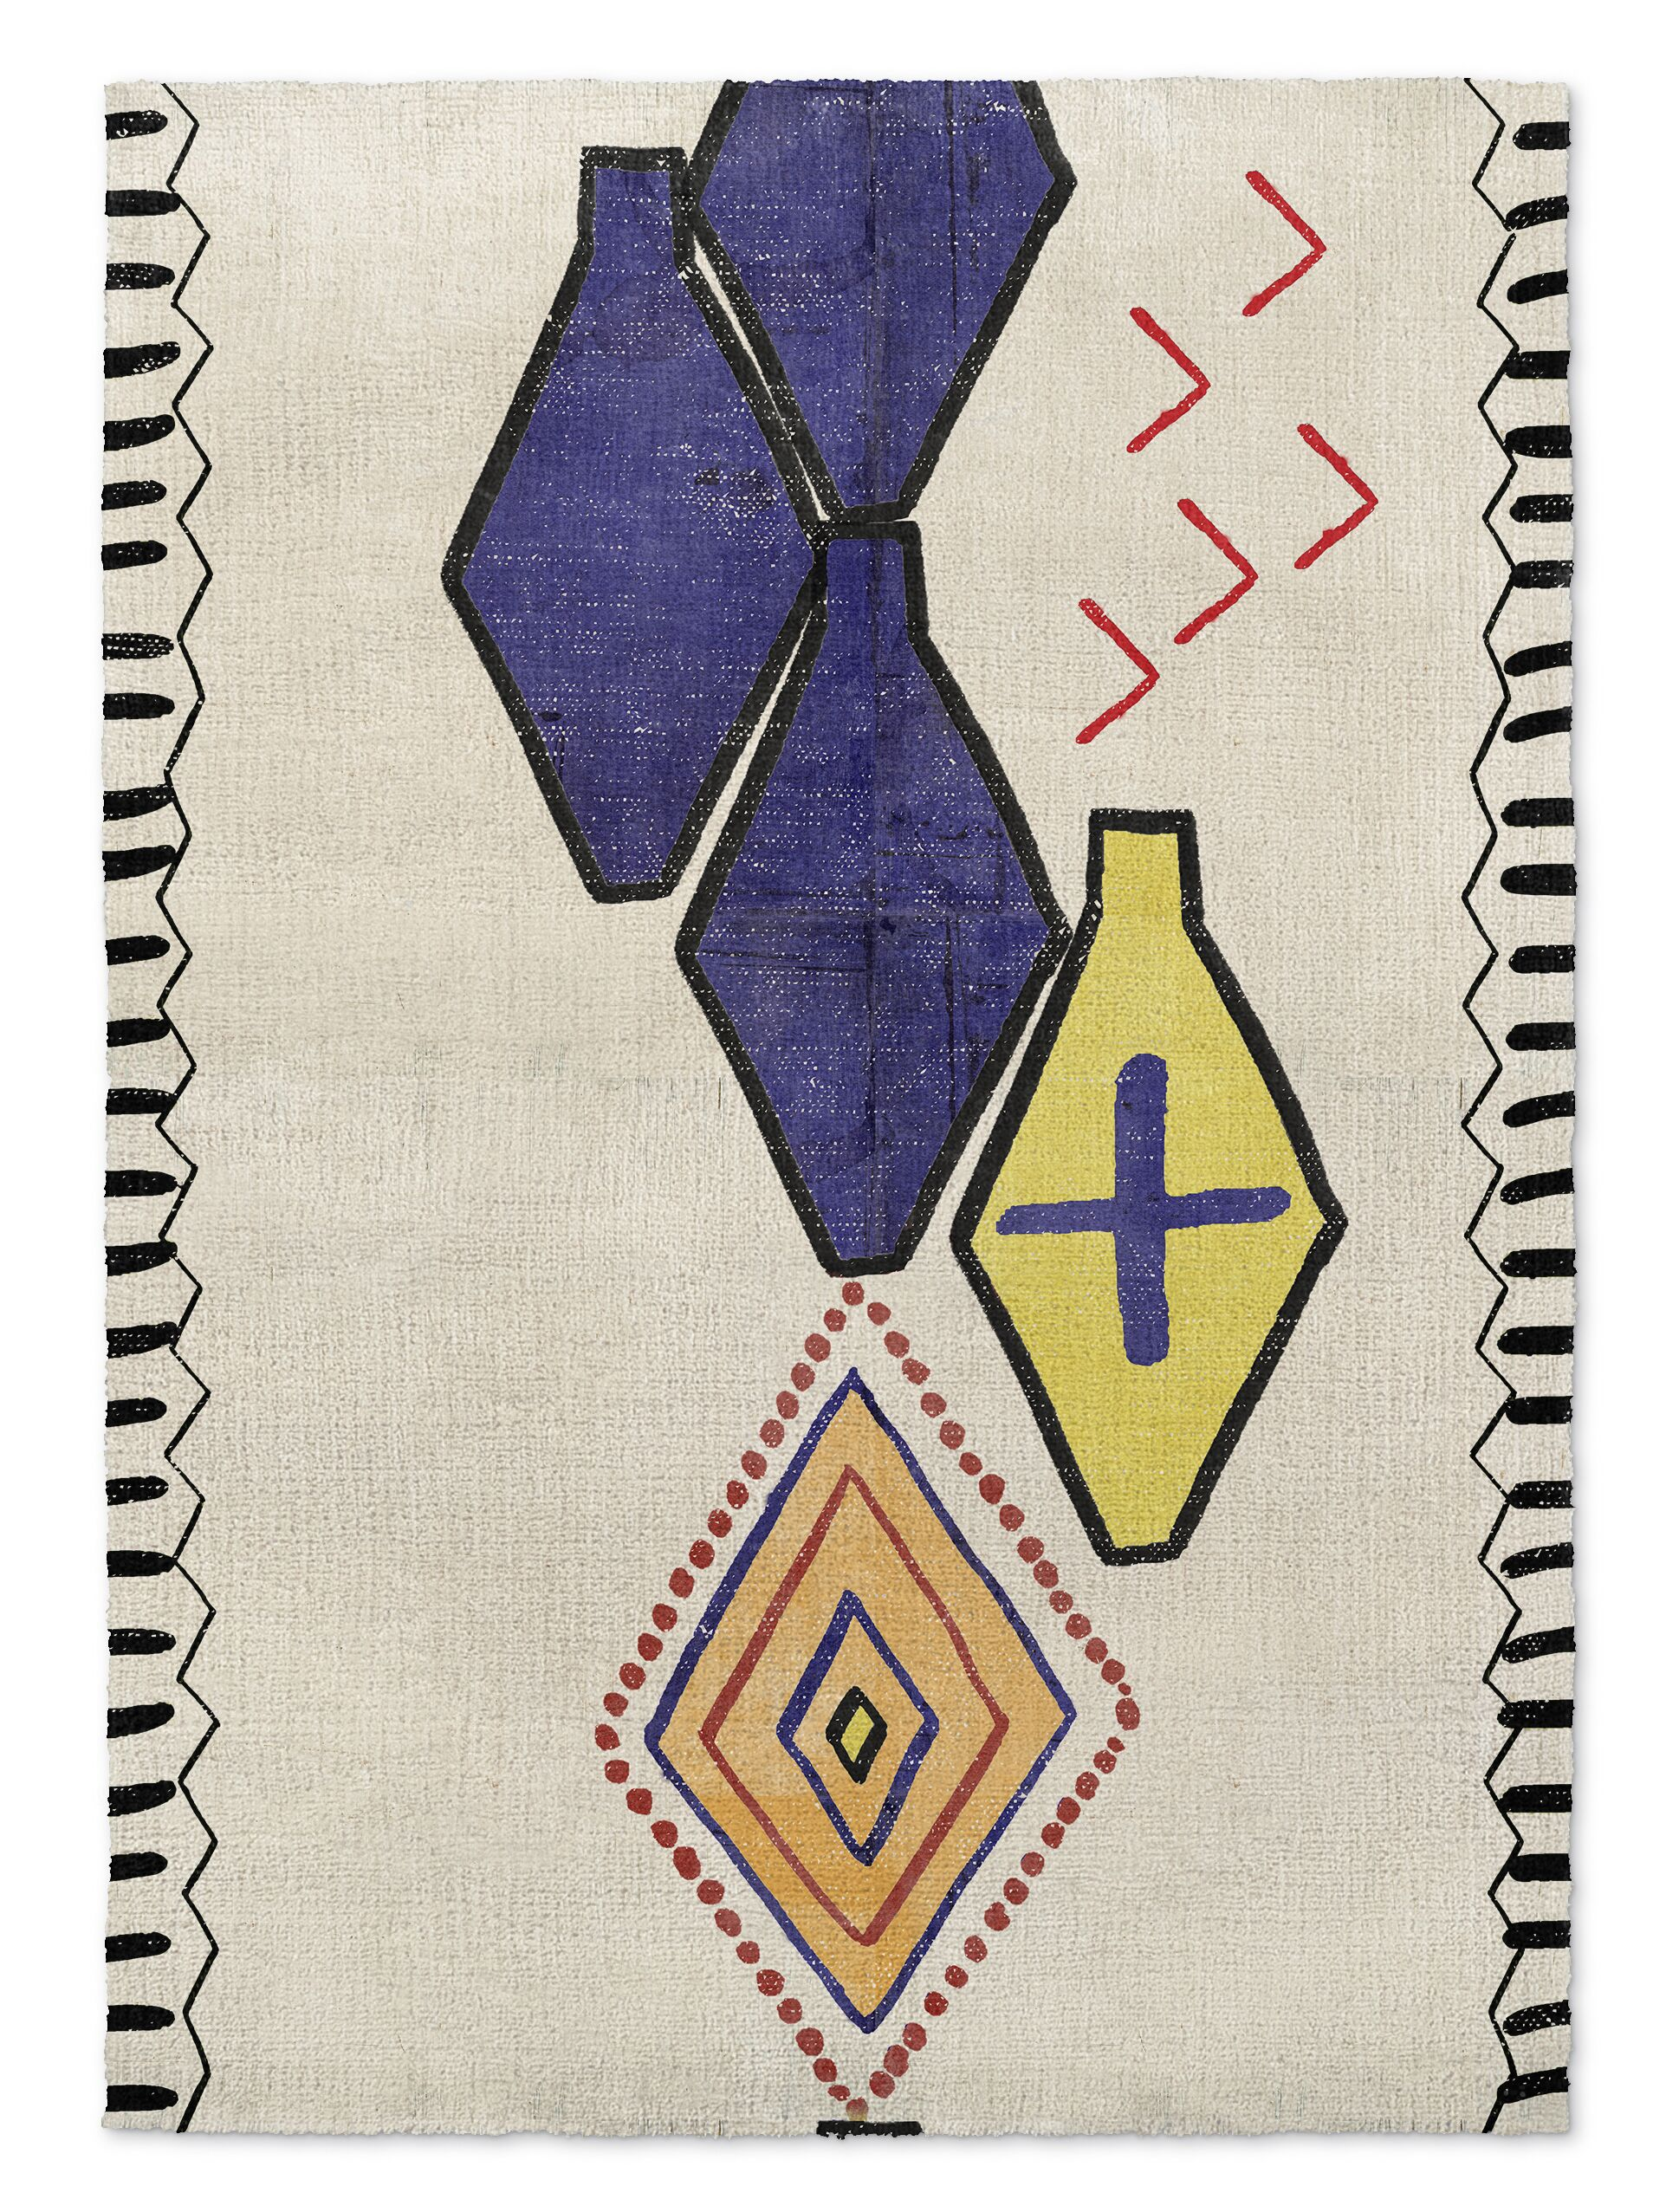 Bousslama Beige/Blue Area Rug Rug Size: Rectangle 8' x 10'